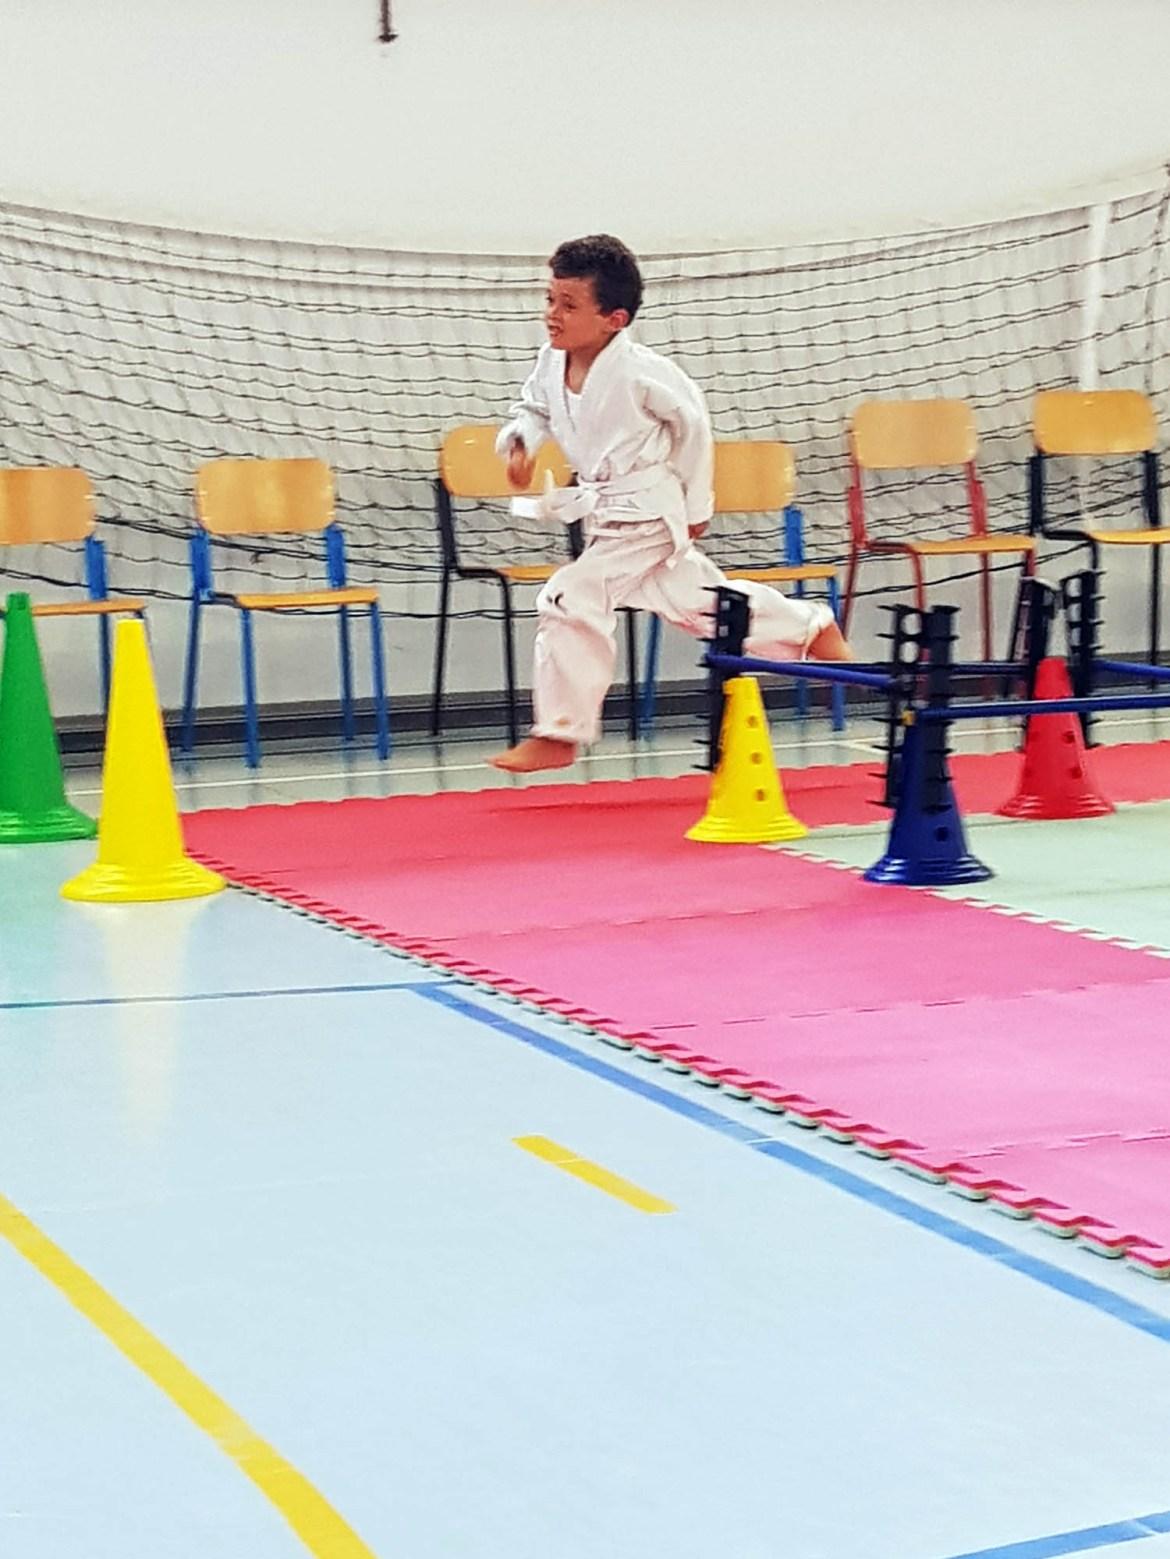 Pietro sprint